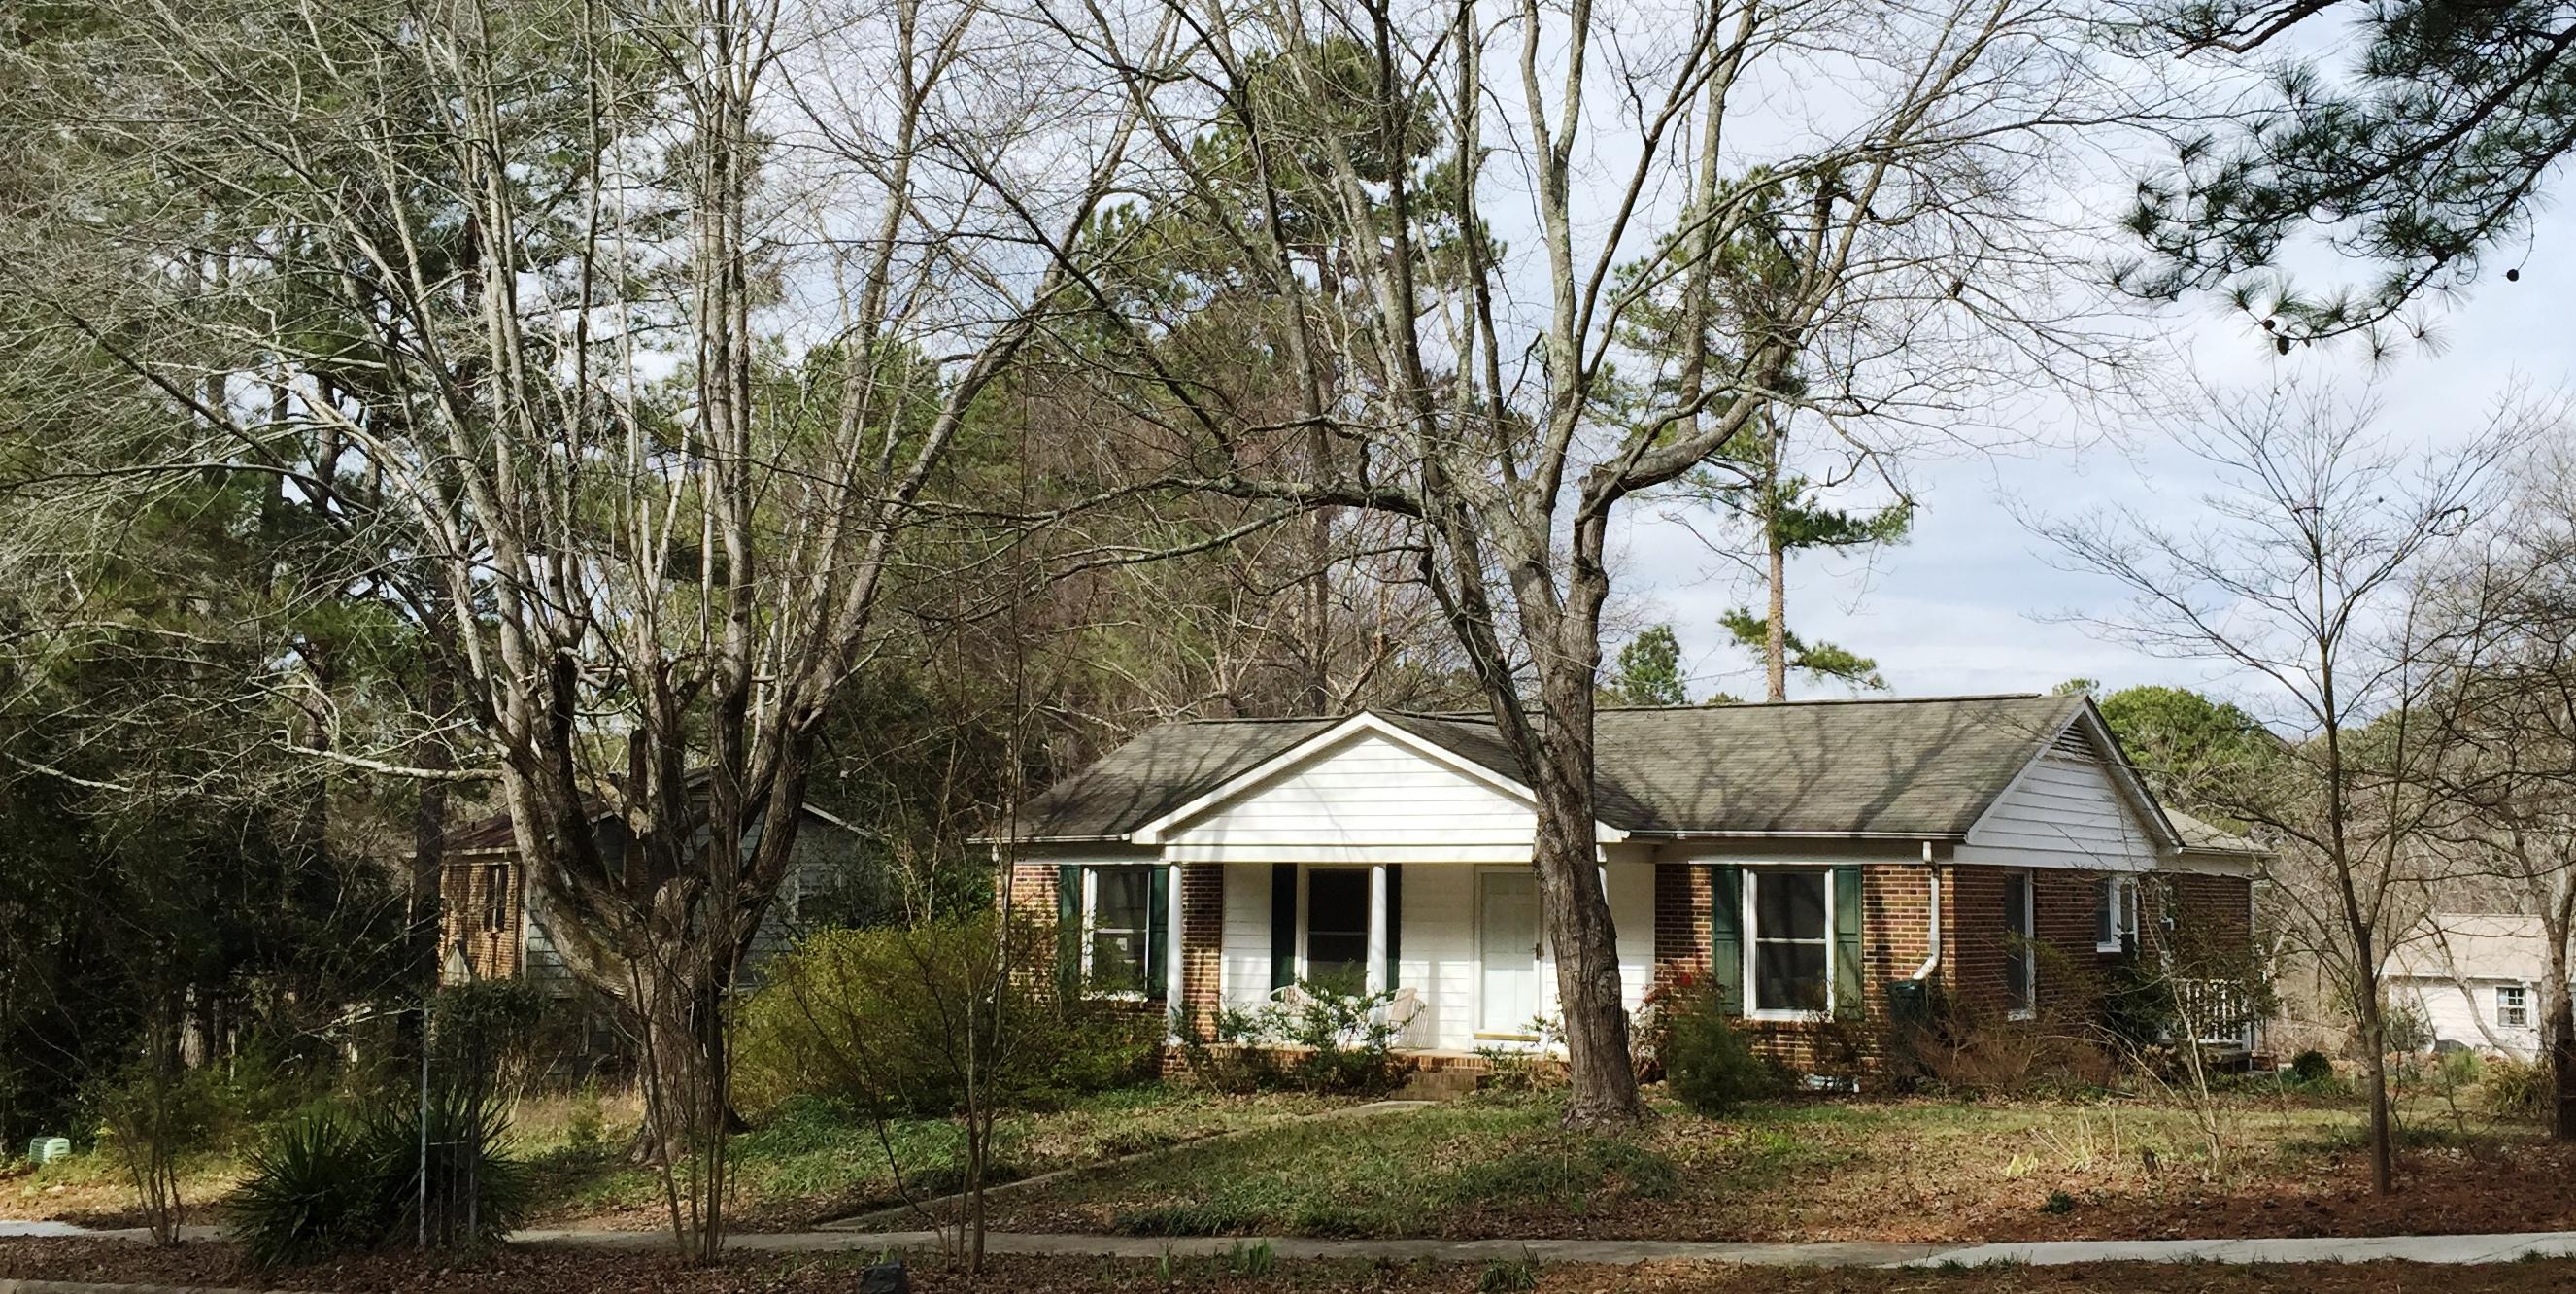 800 Northclift Drive, Raleigh, NC 27609